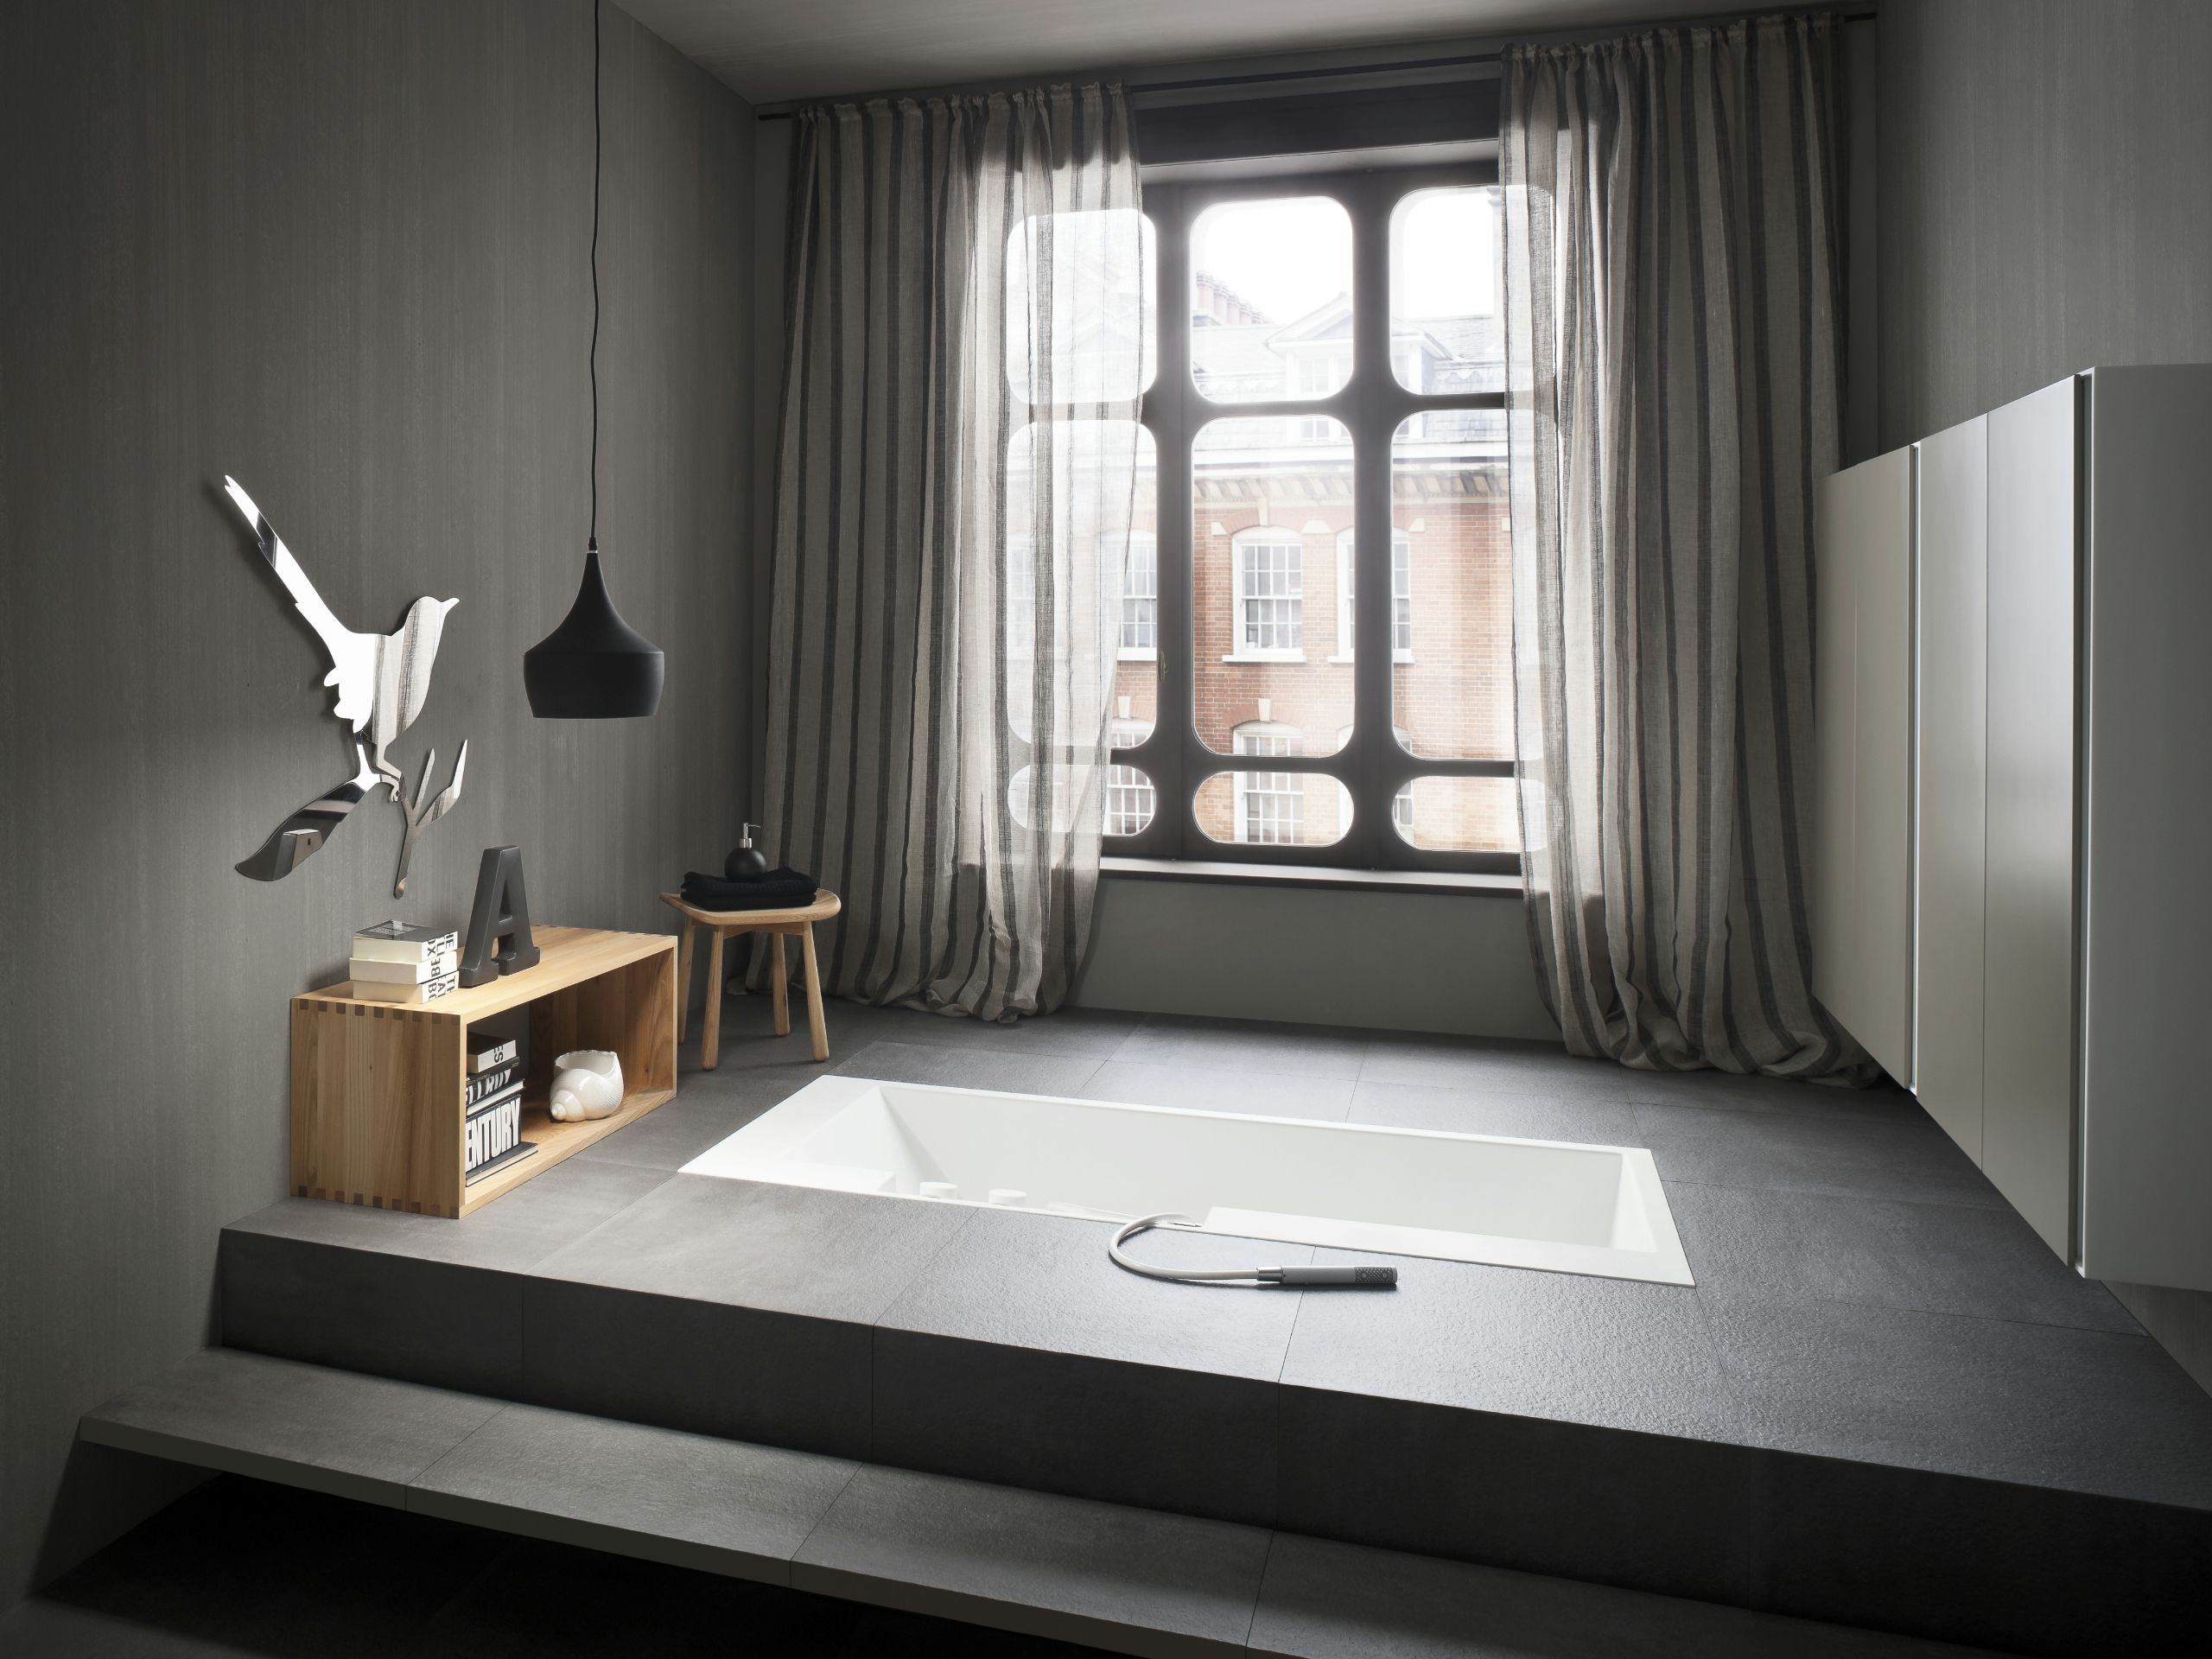 FONTE Badezimmerhocker Aus Ulme By Rexa Design Design Monica Graffeo